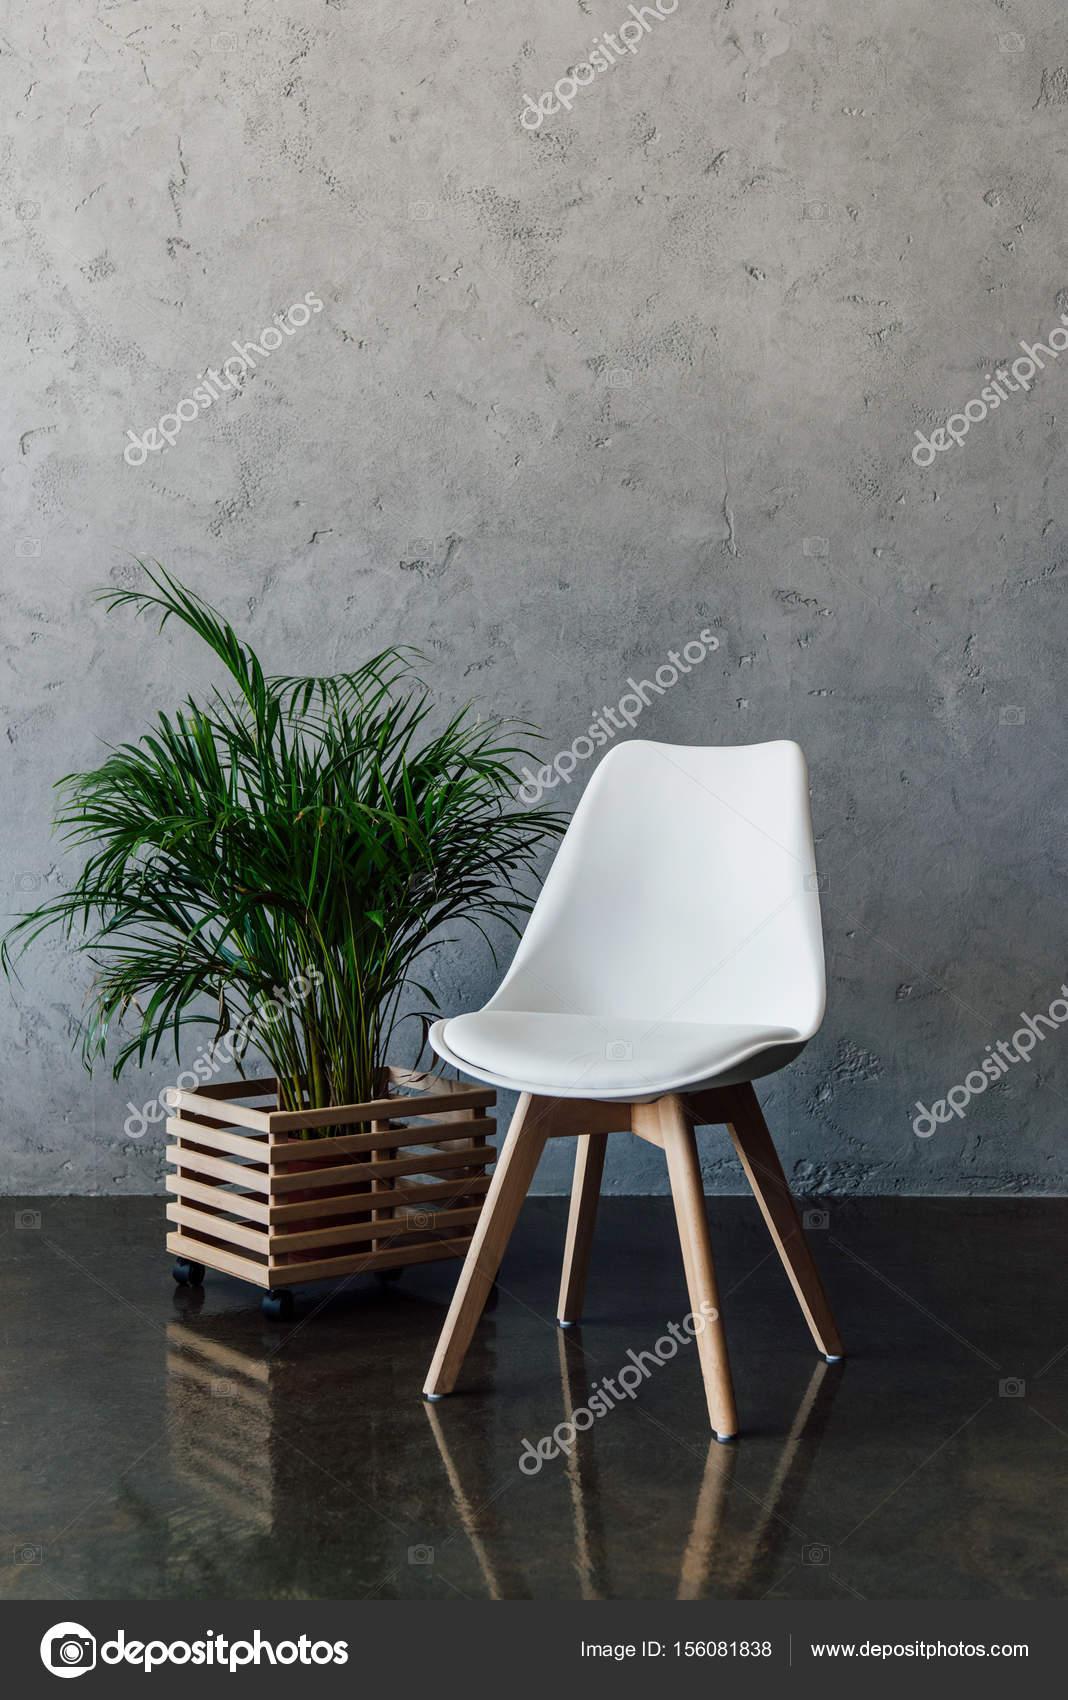 chaise blanche moderne photographie y boychenko 156081838. Black Bedroom Furniture Sets. Home Design Ideas